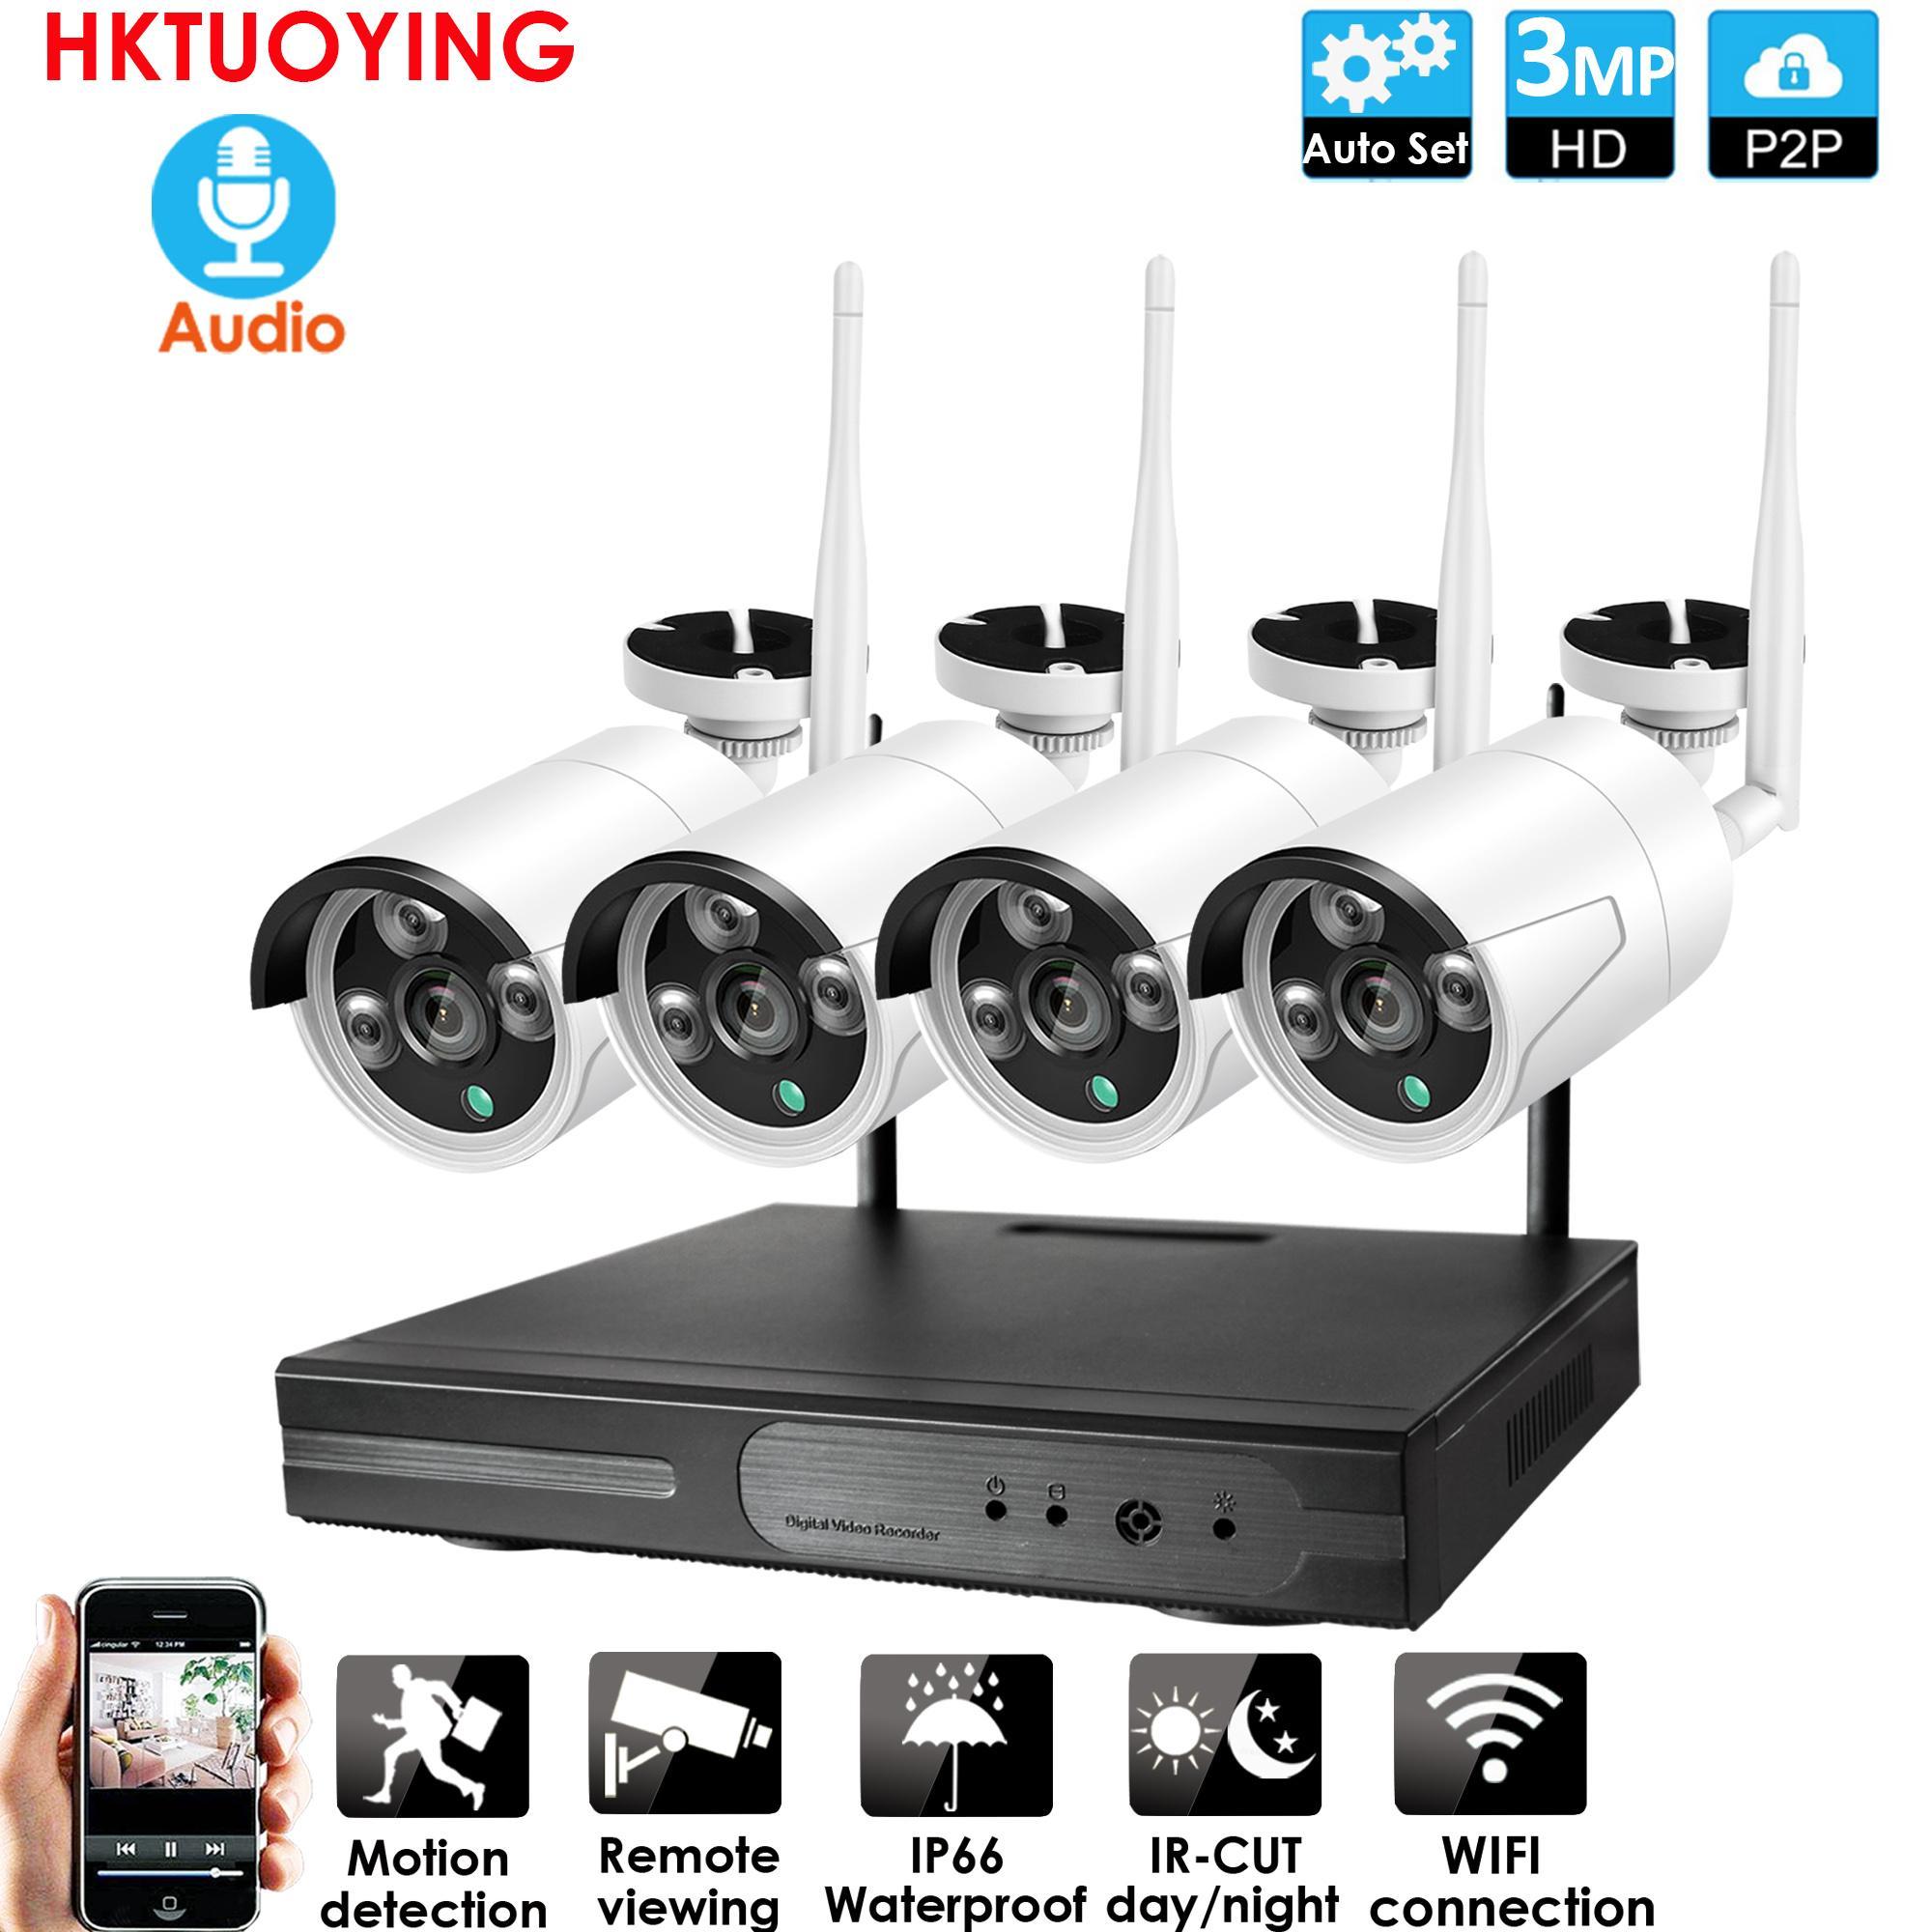 4CH 3.0MP Audio CCTV System wireless 1080P NVR Recorder 3.0MP IR Outdoor P2P WiFi IP 720P Audio CCTV Security System Surveillance Kit